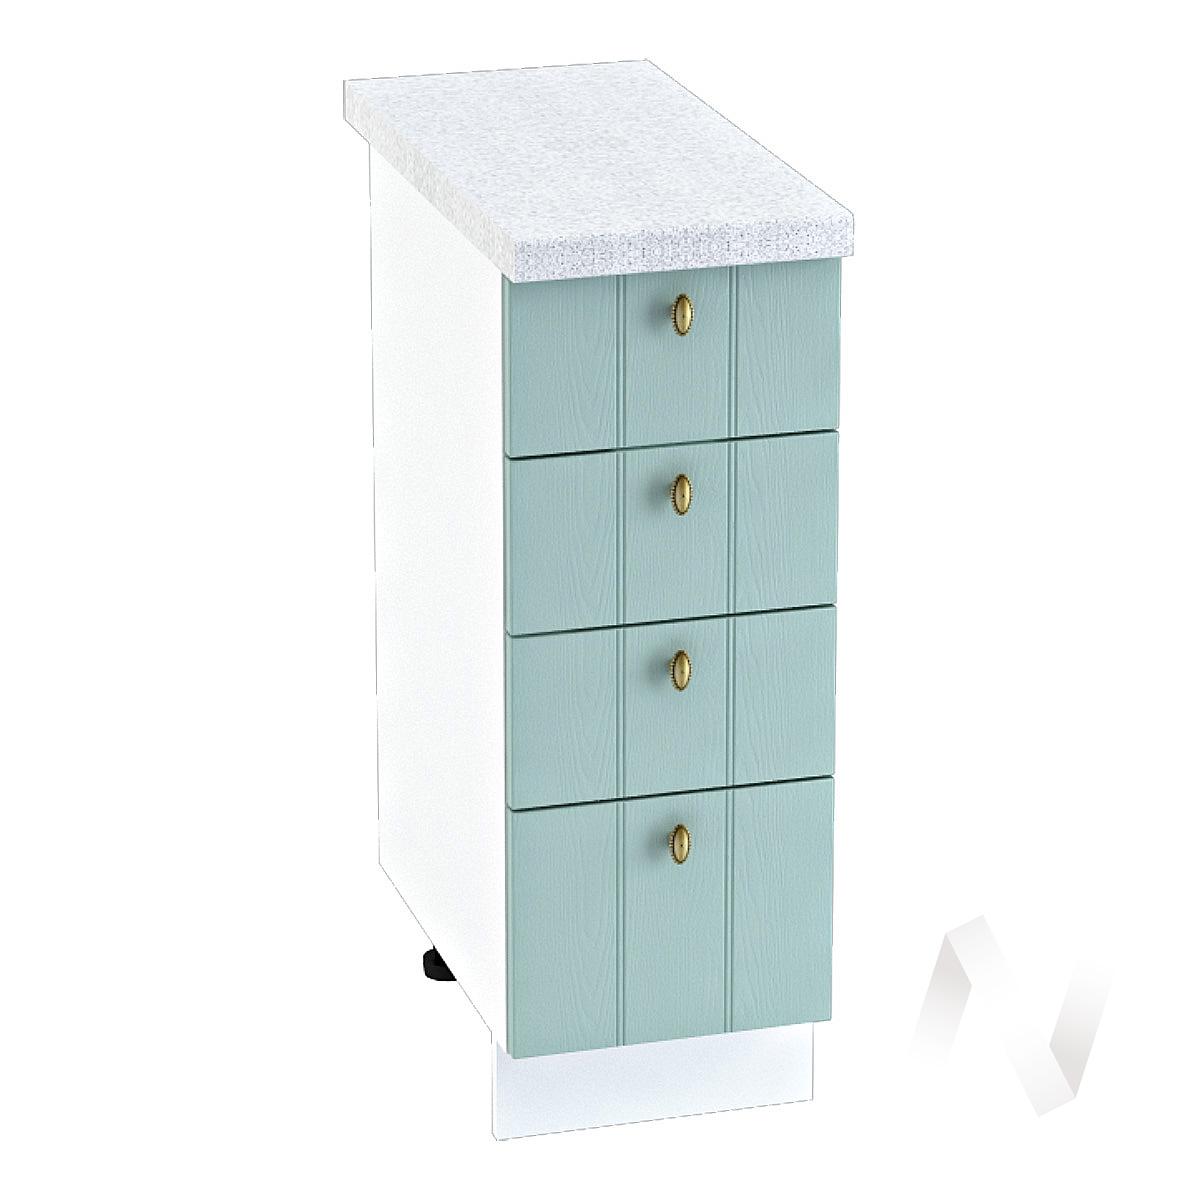 "Кухня ""Прованс"": Шкаф нижний с 4-мя ящиками 300, ШН4Я 300 (голубой/корпус белый)"